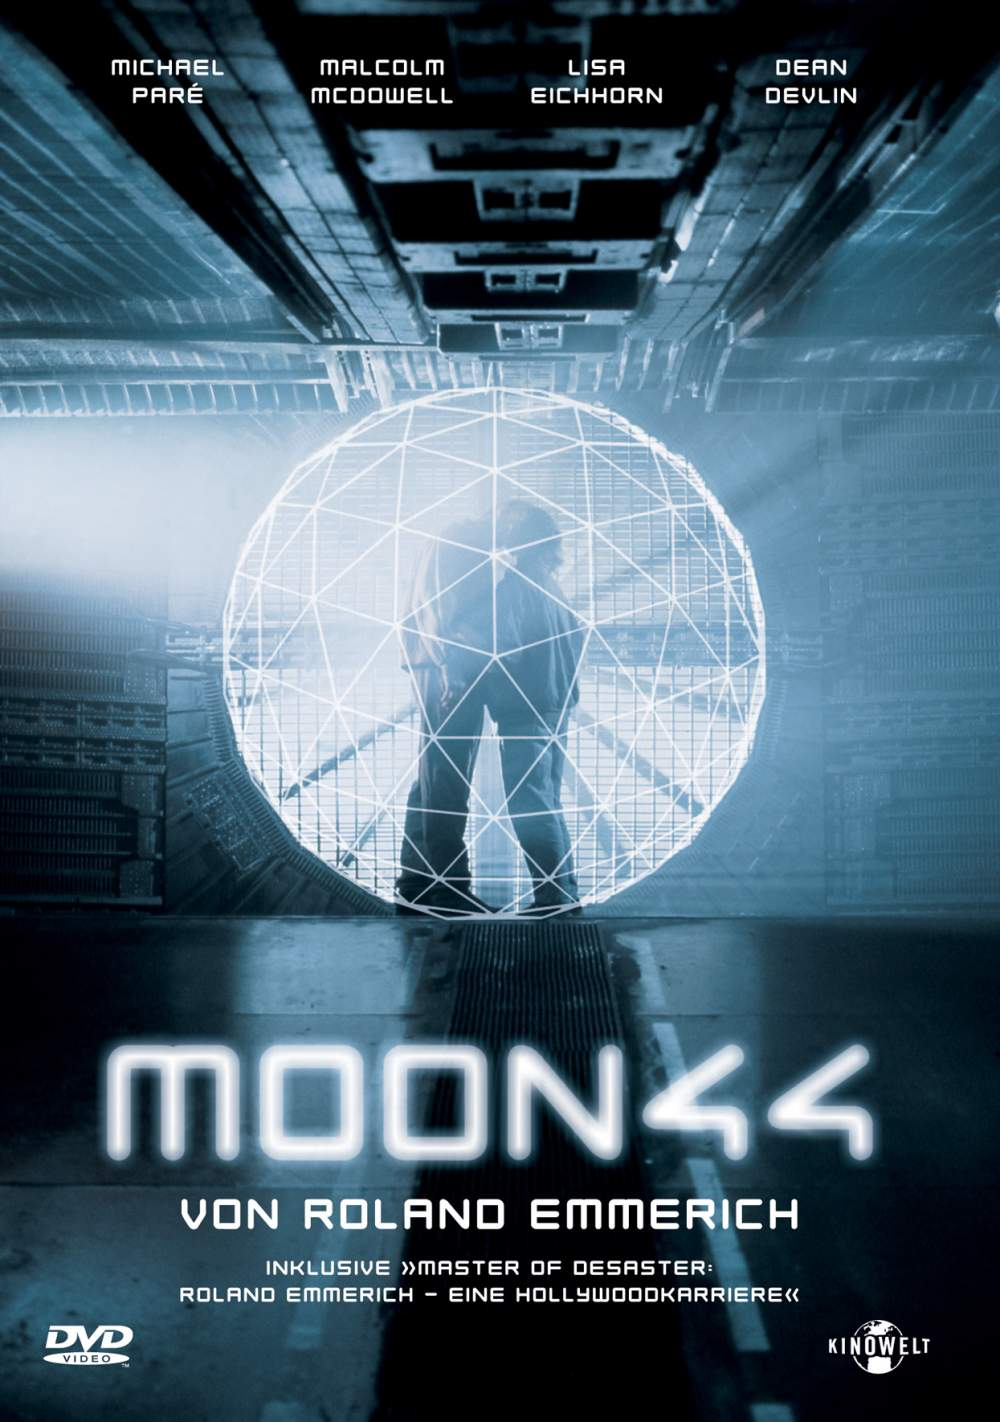 Moon 44 affiche